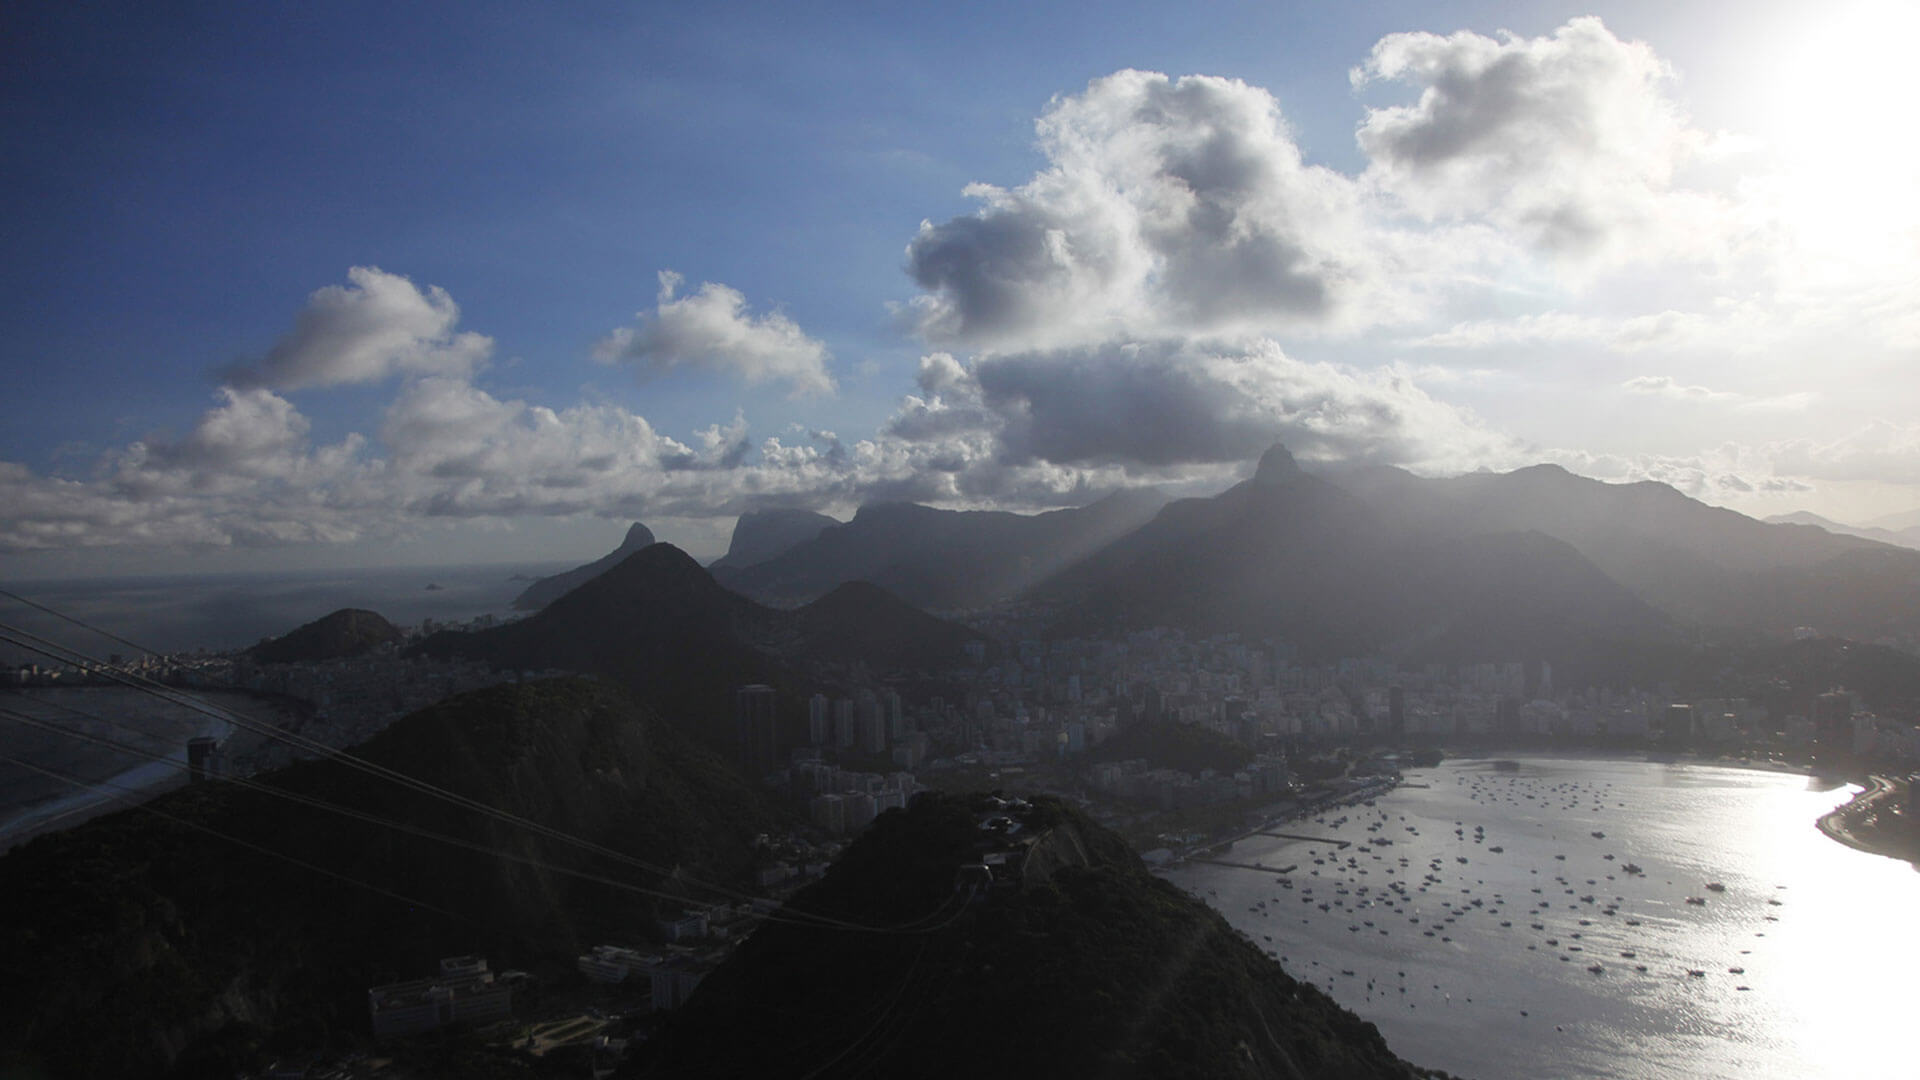 Sud America Tour: Rio